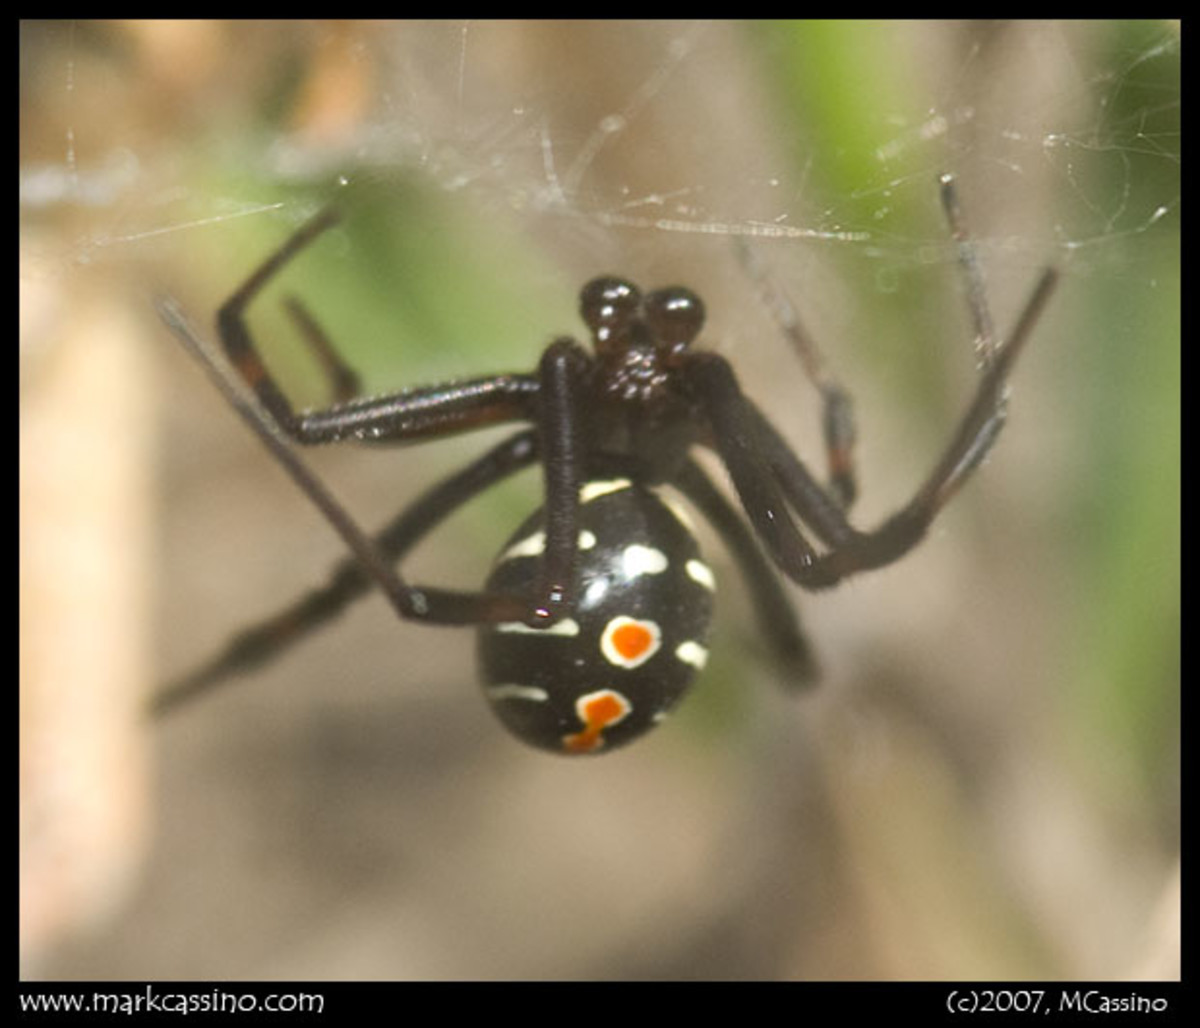 black-widow-spiders-found-in-north-dallas-texas